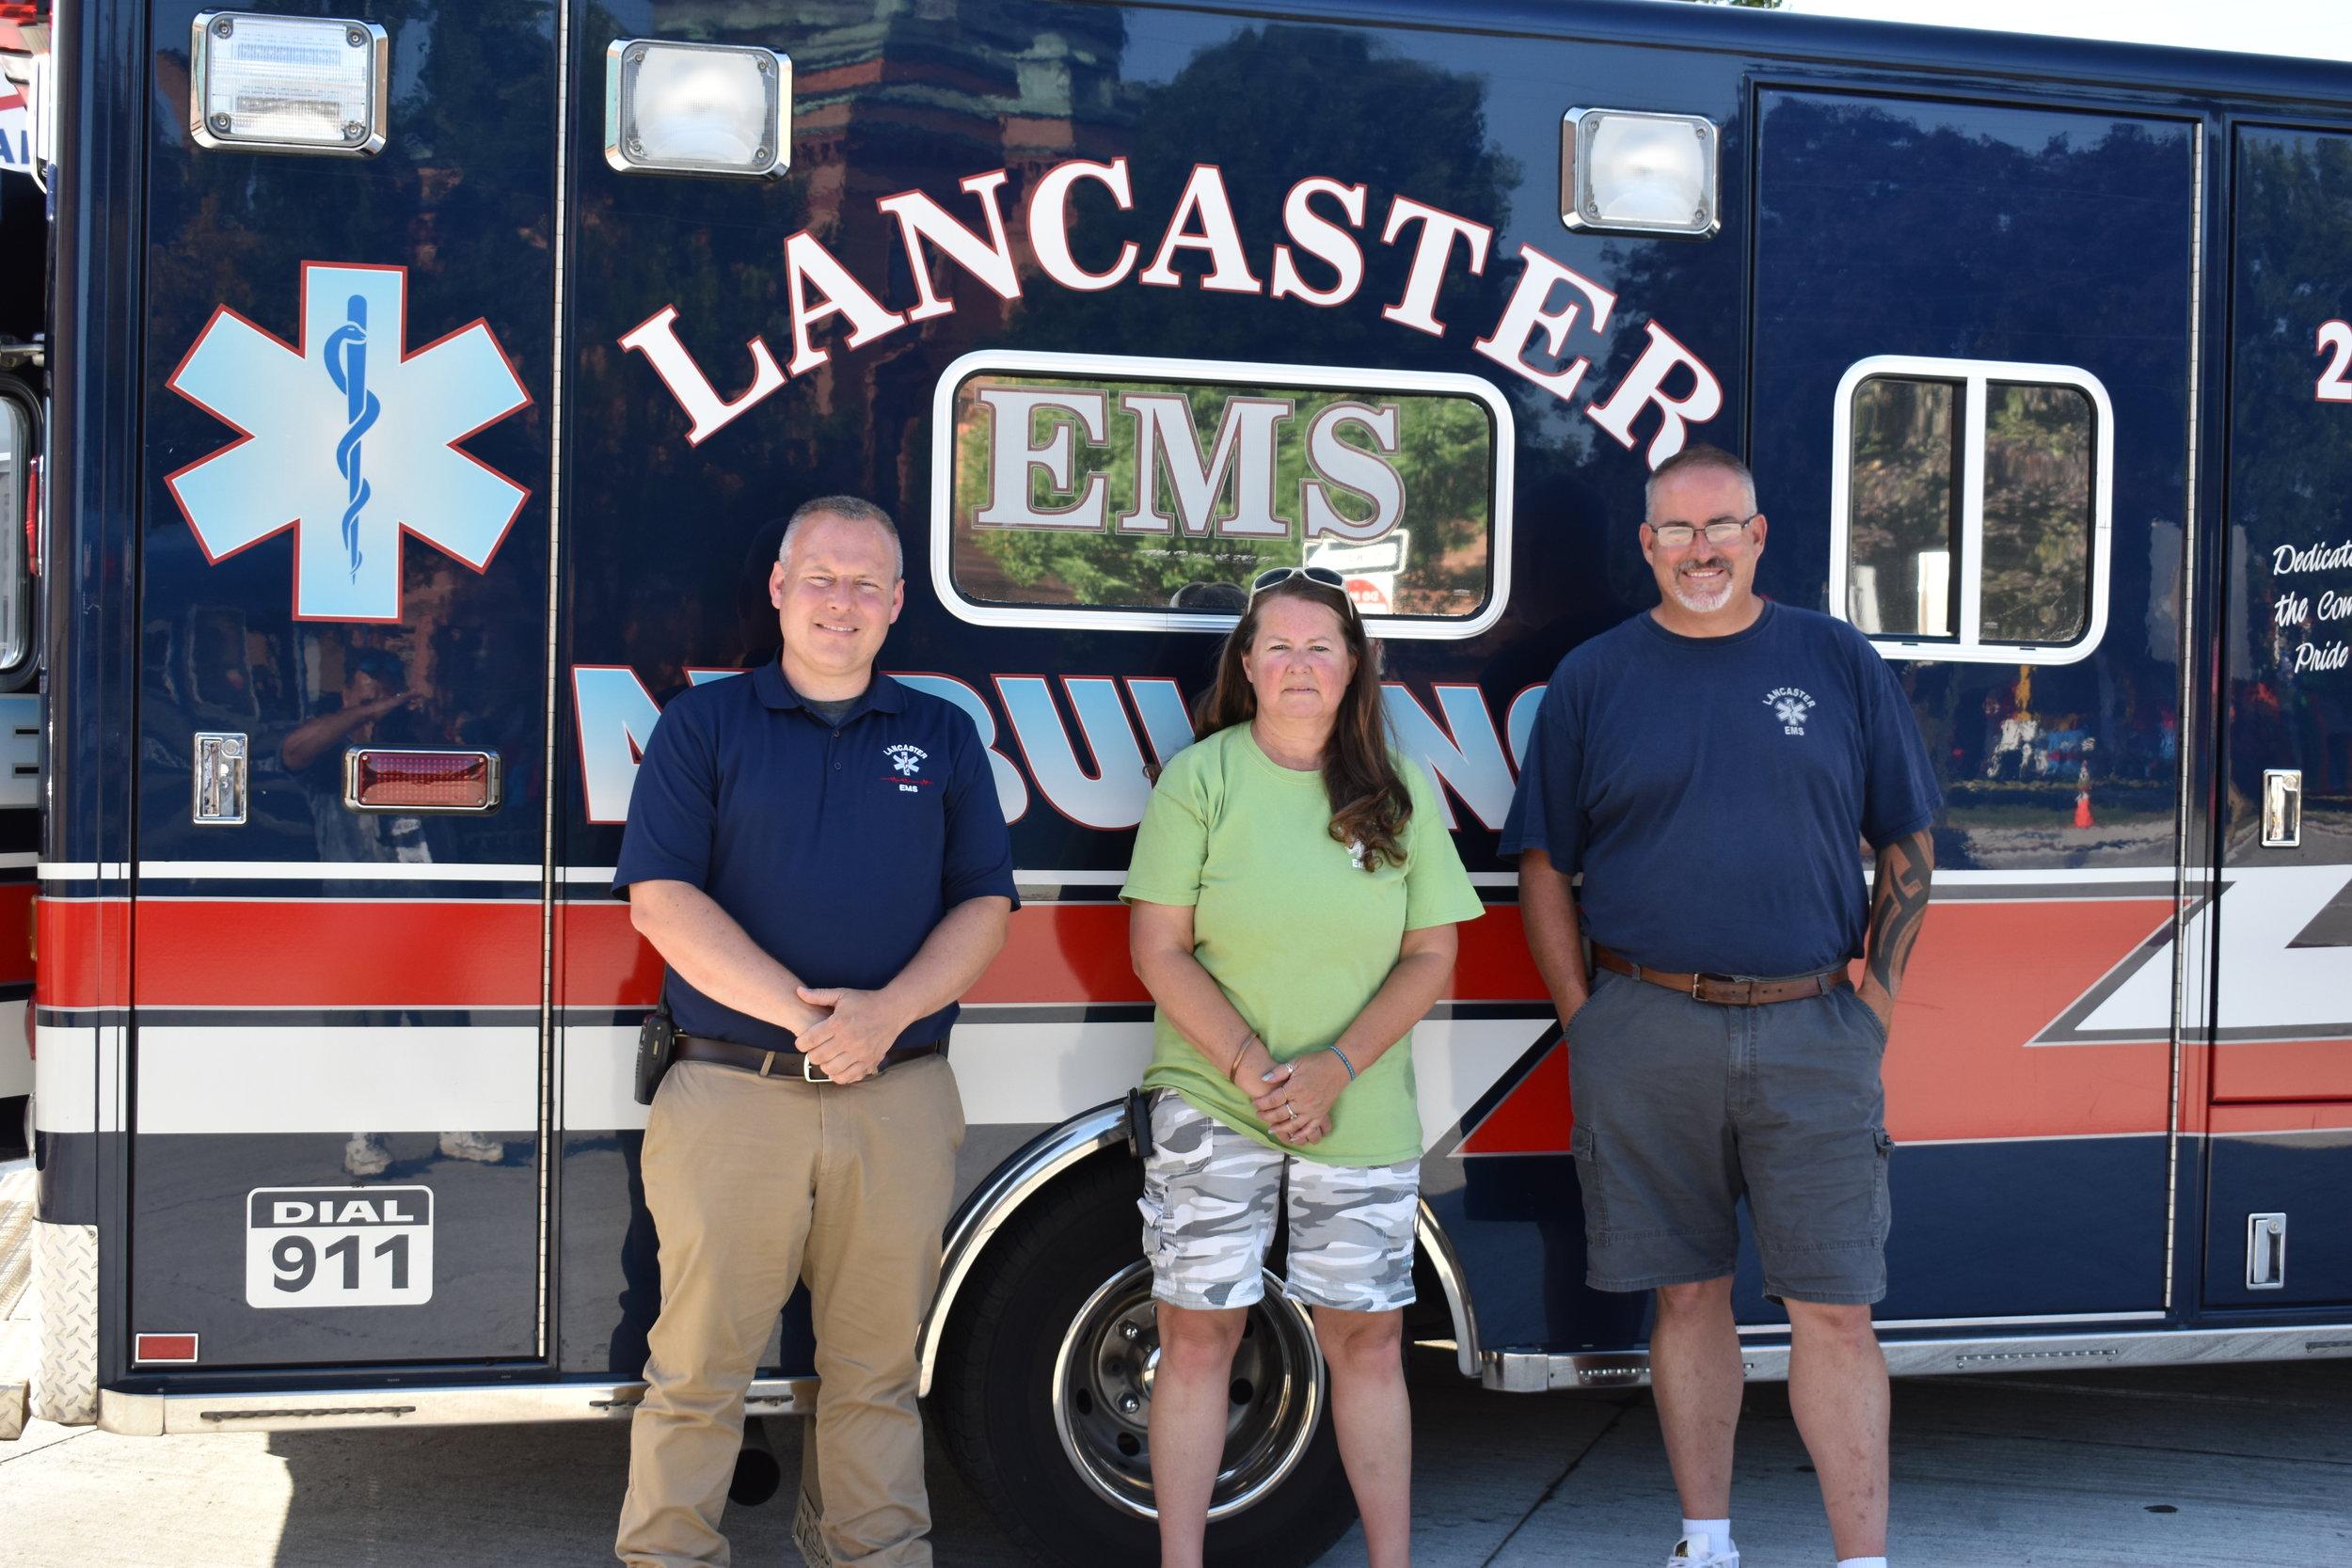 L to R- Steve Braun, Nancy Moore, Michael Shinee of the Lancaster EMS